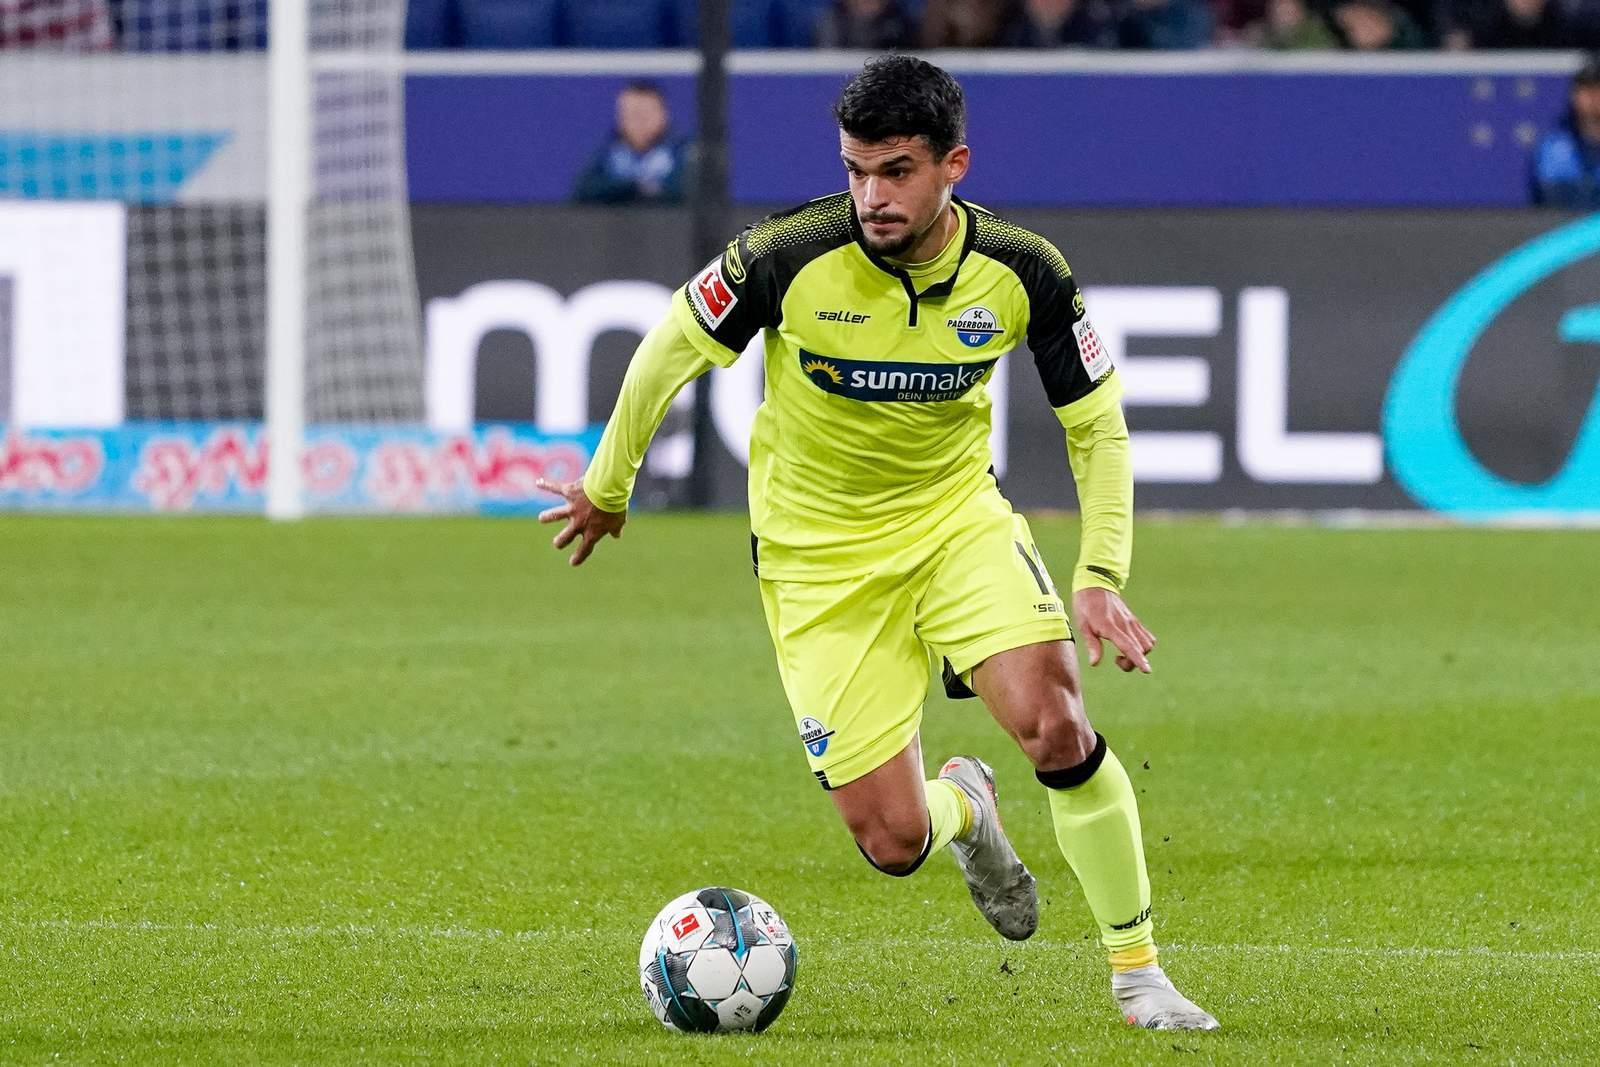 Cauly Oliveira Souza vom SC Paderborn